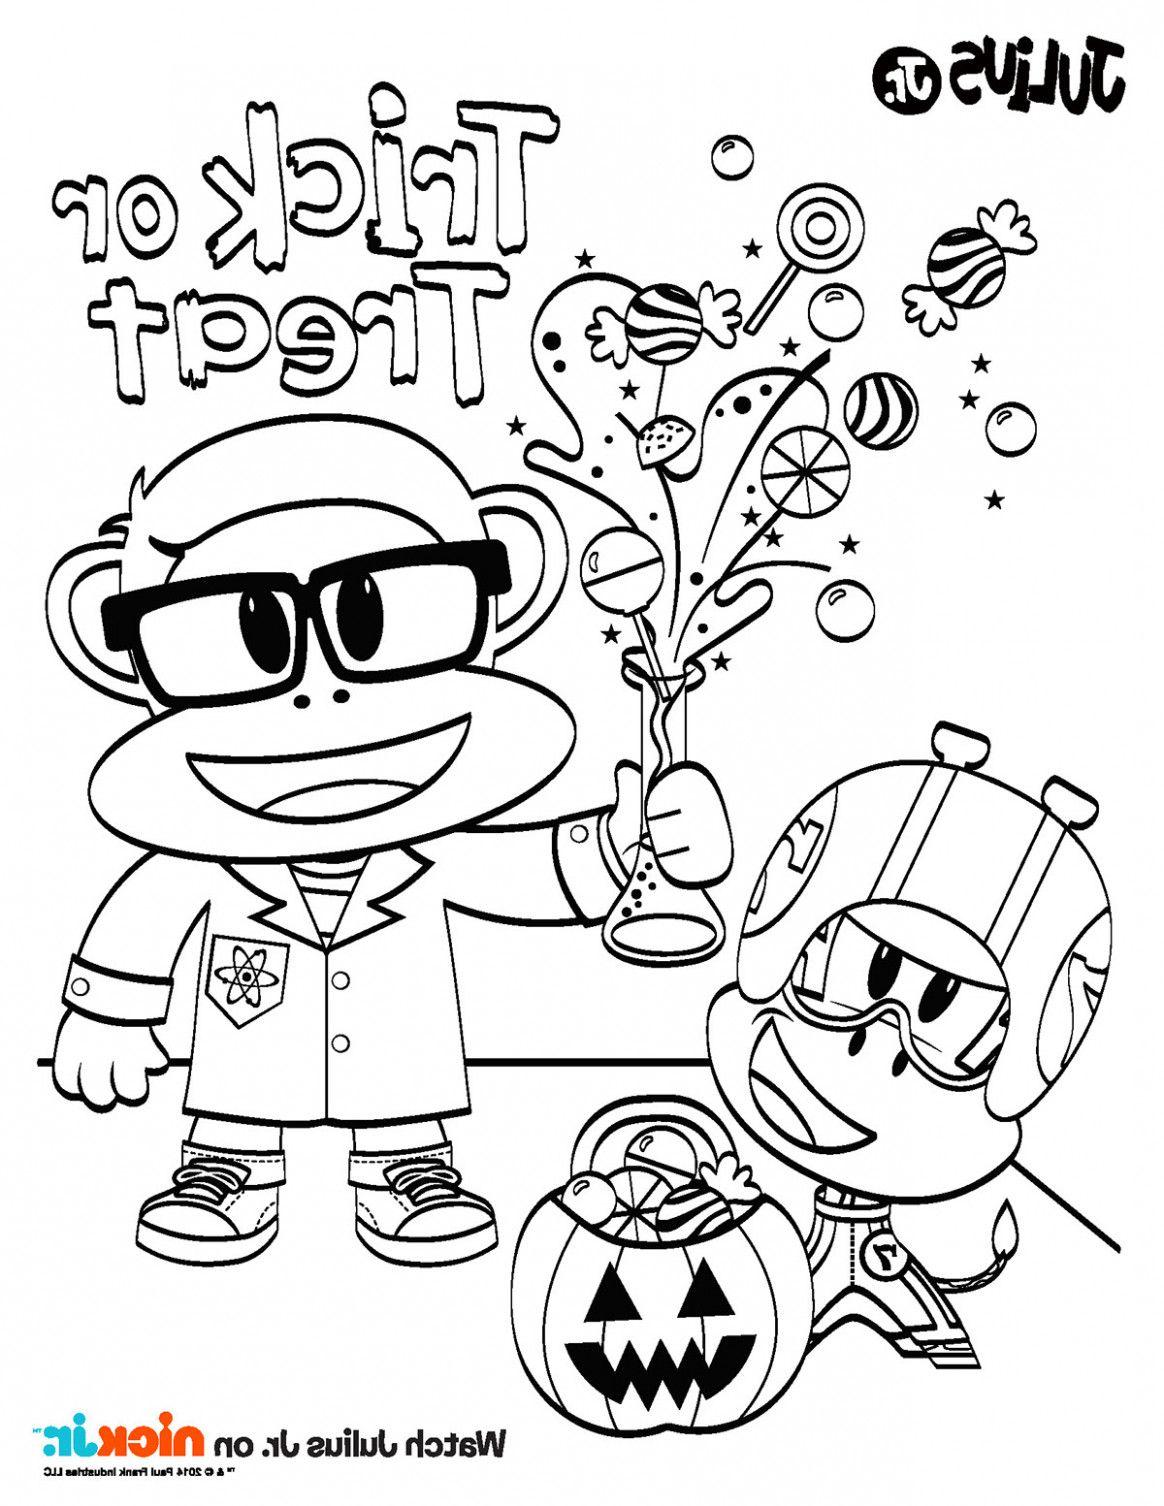 Disney Jr Coloring Pages Halloween - Digital Addiction